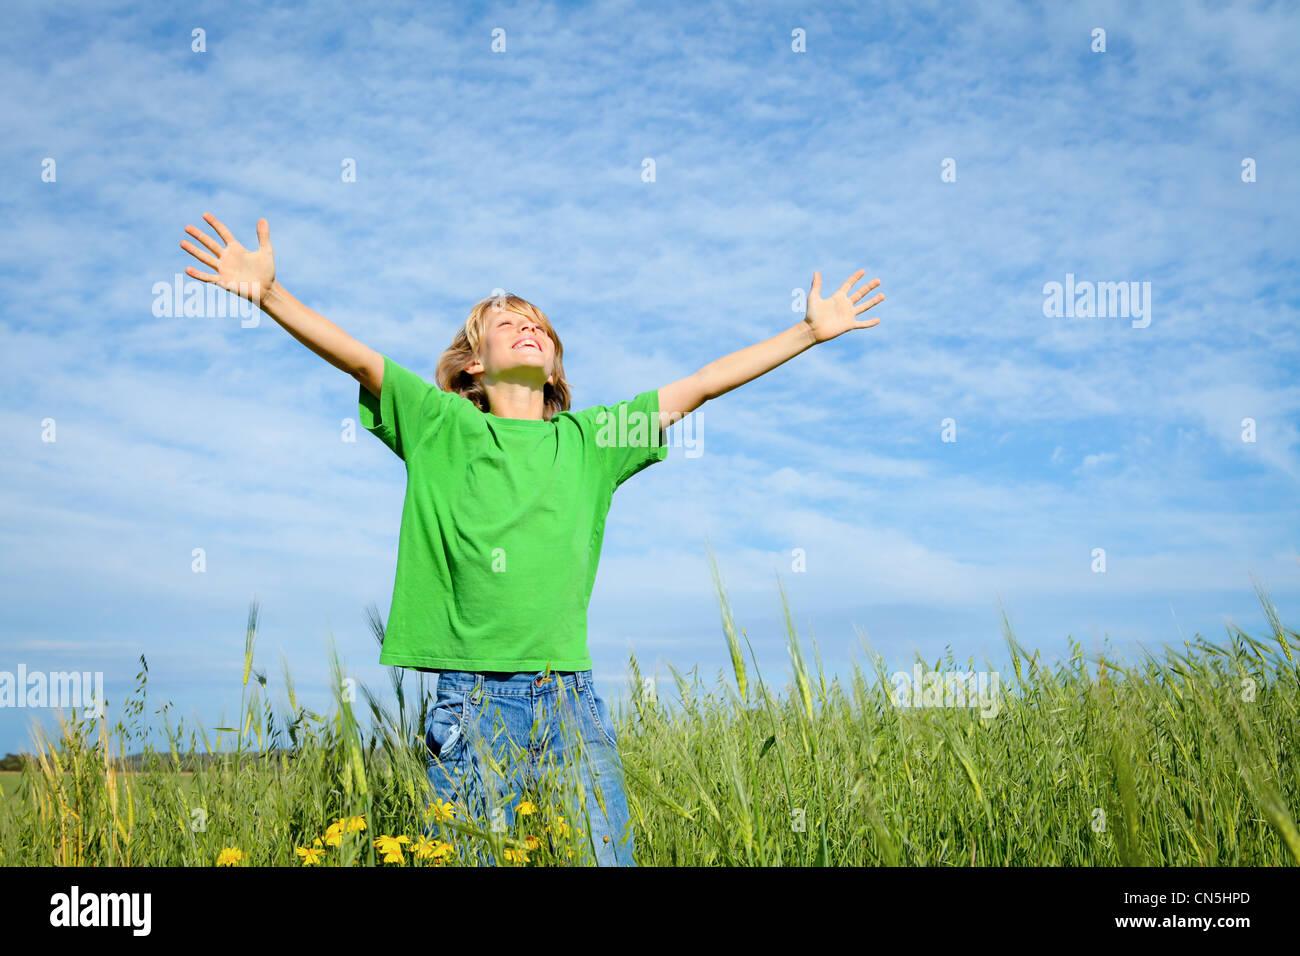 Estate felice kid Immagini Stock